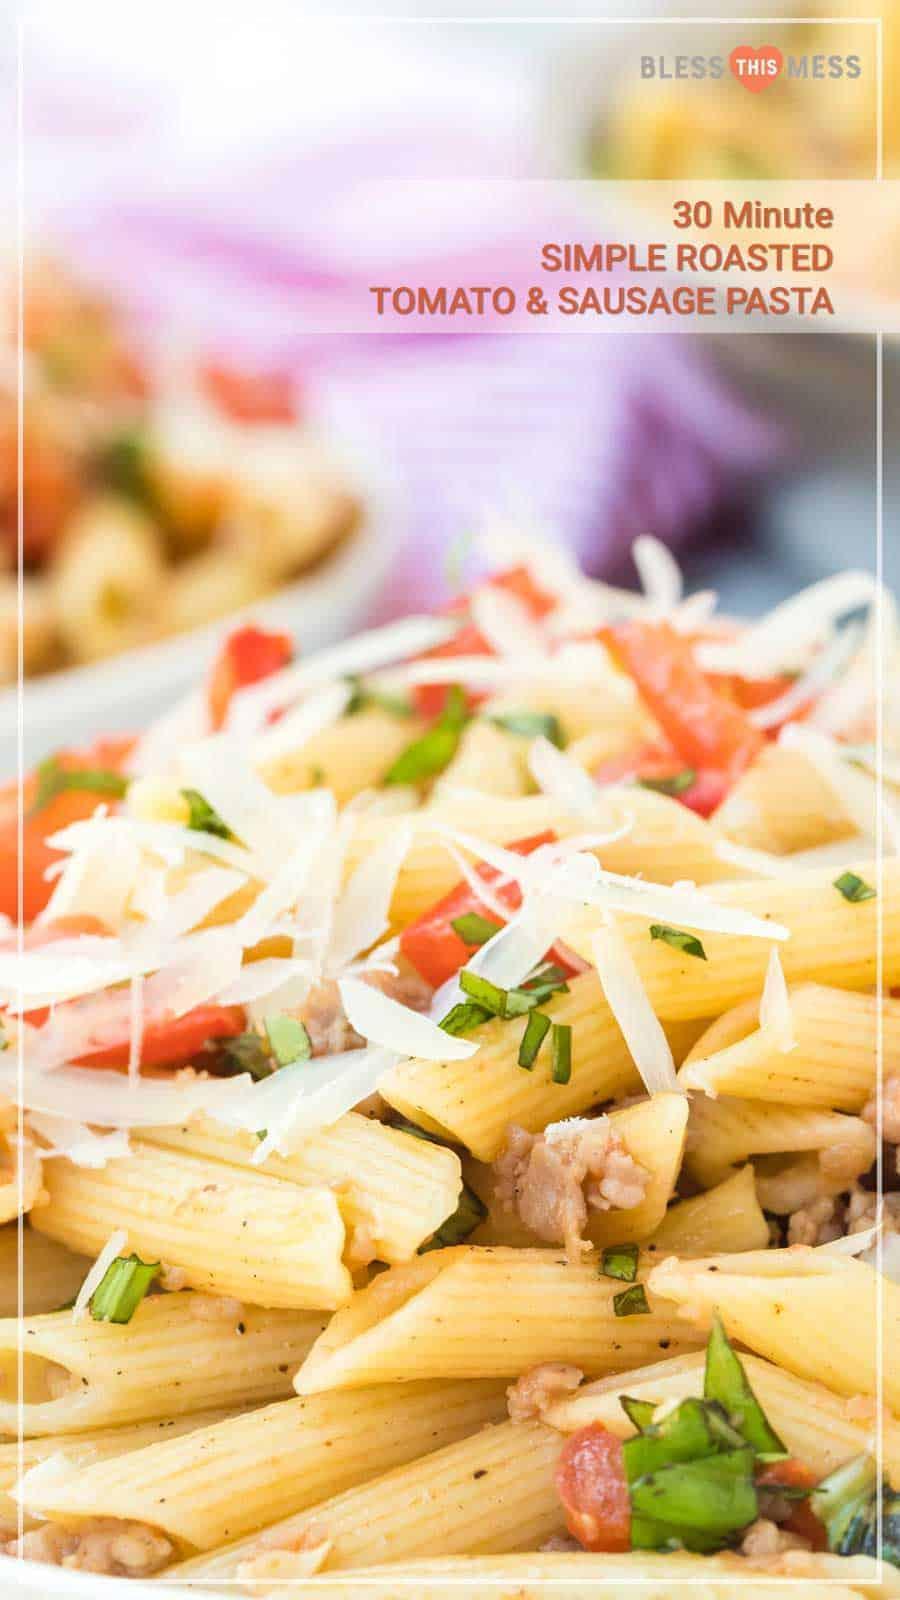 Close-Up Image of Roasted Tomato & Sausage Pasta